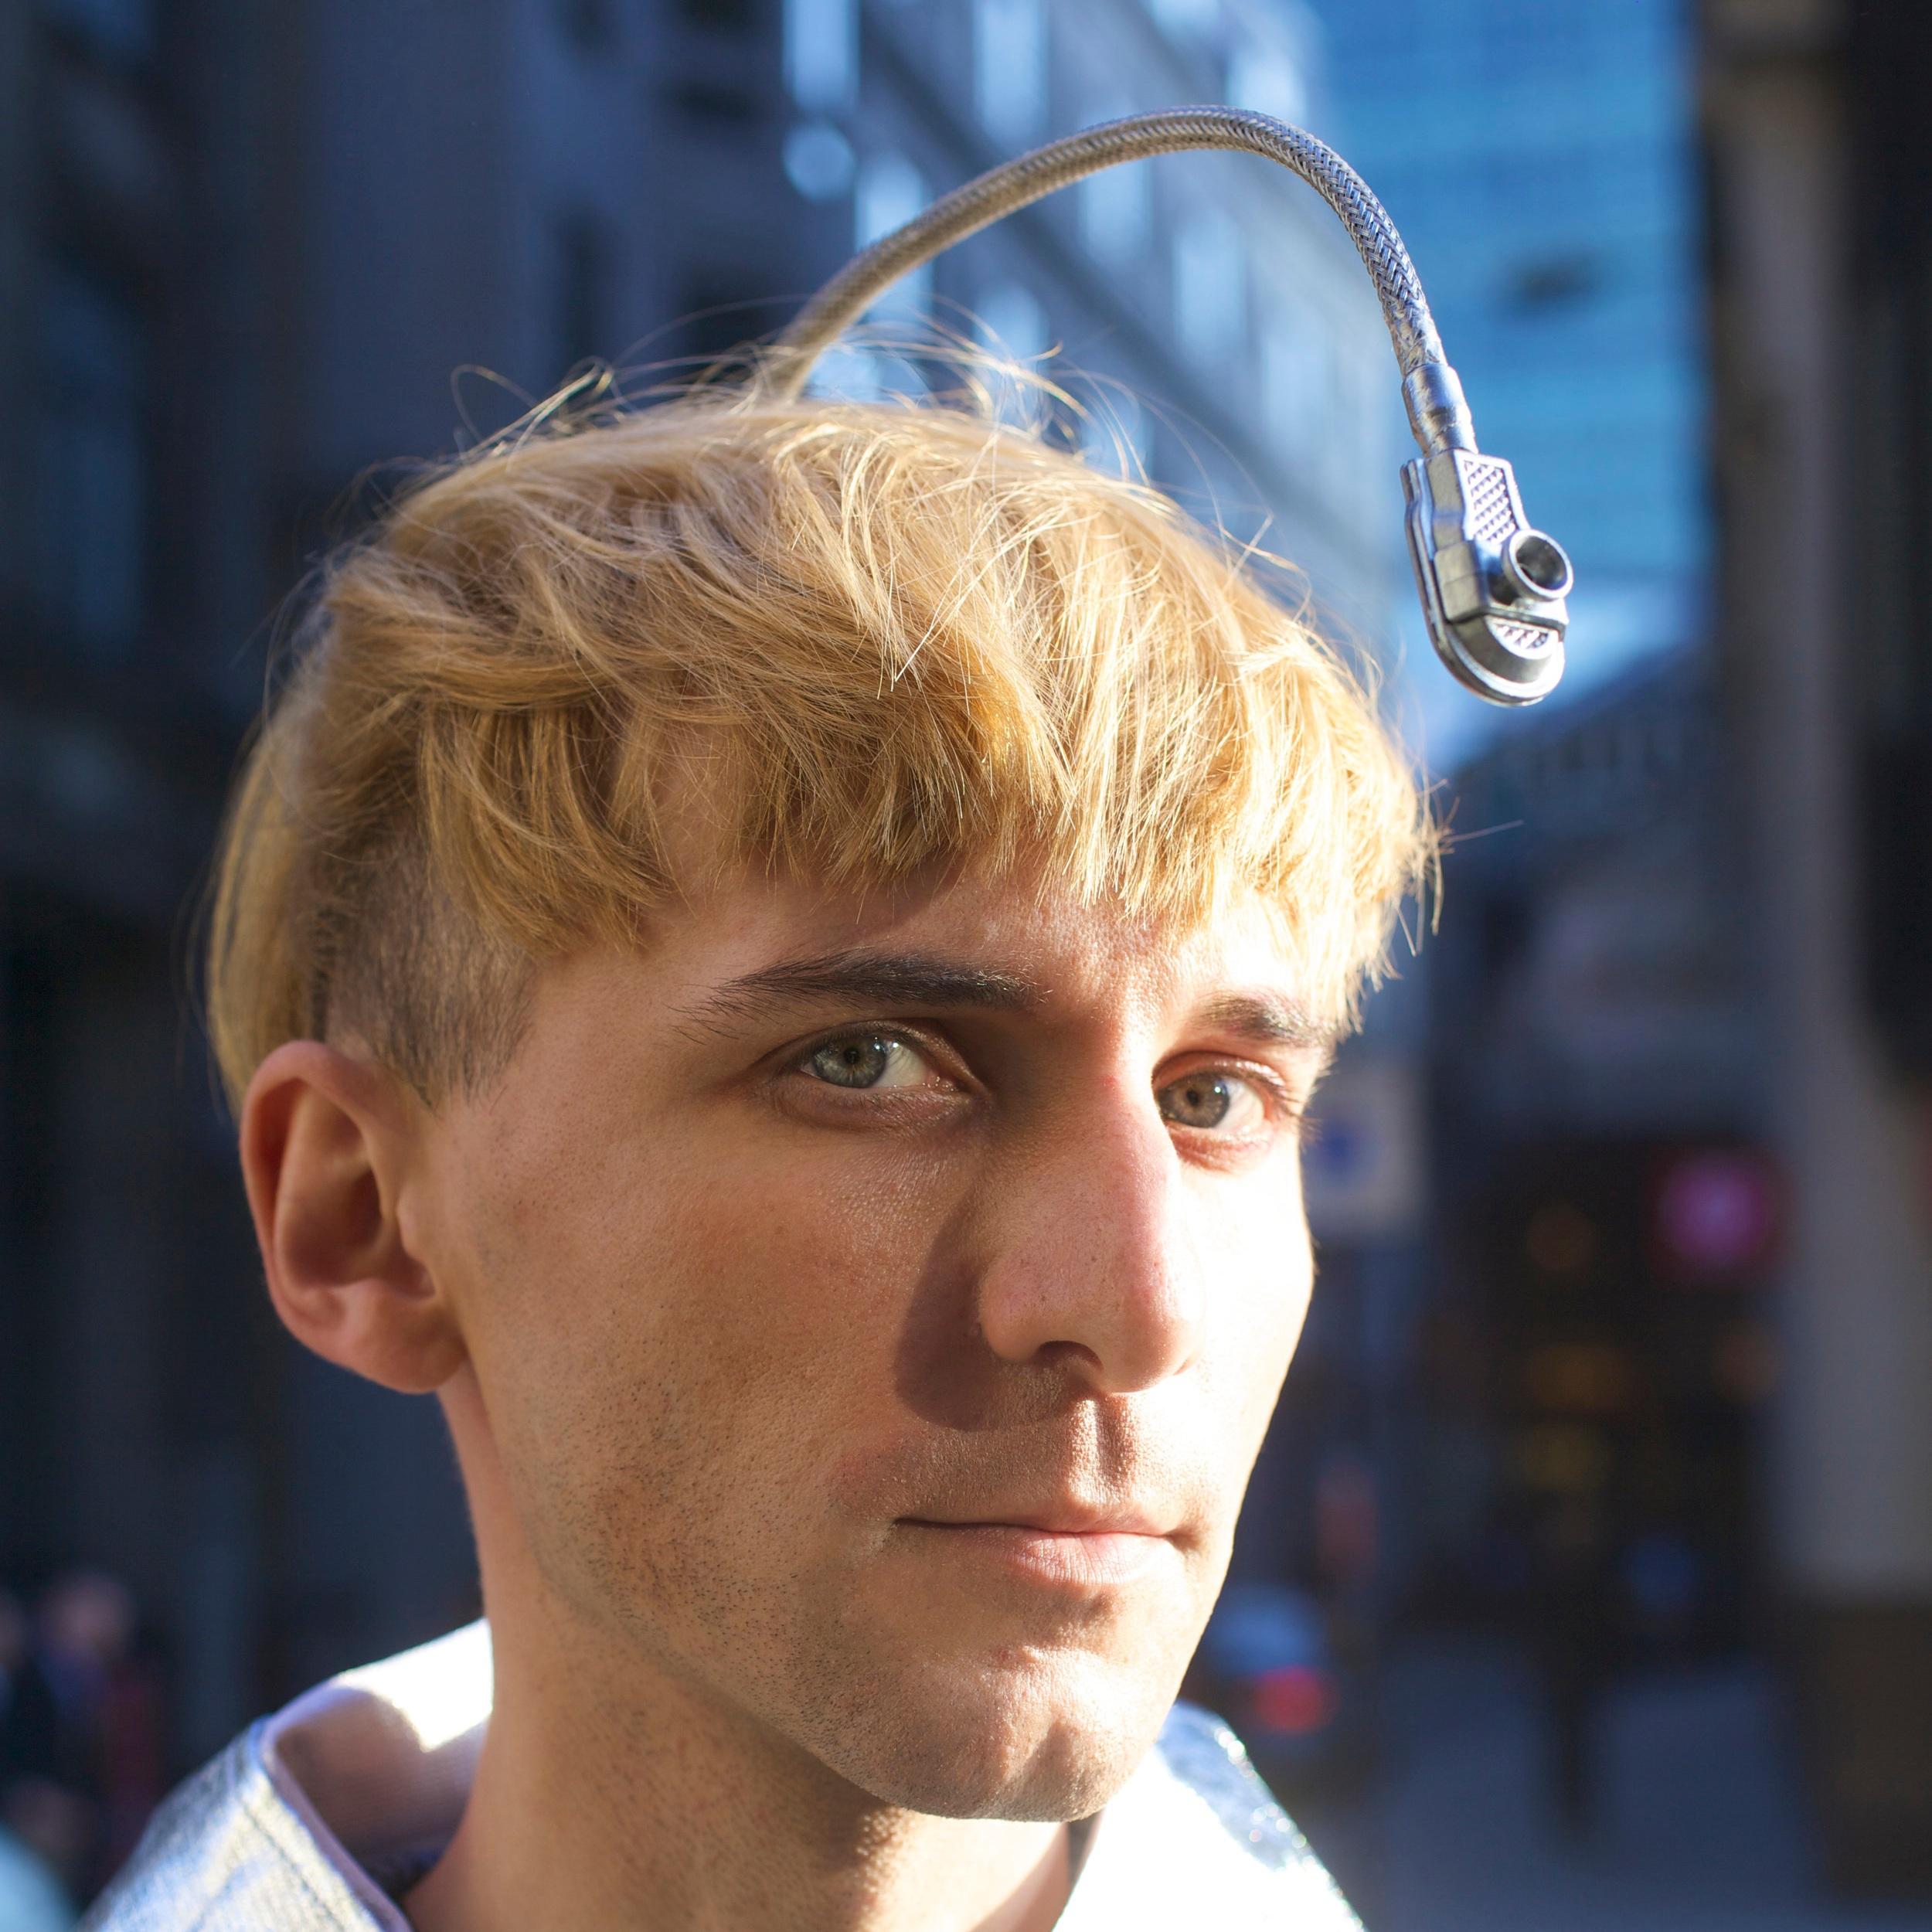 Neil Harbisson - Cyborg Artist